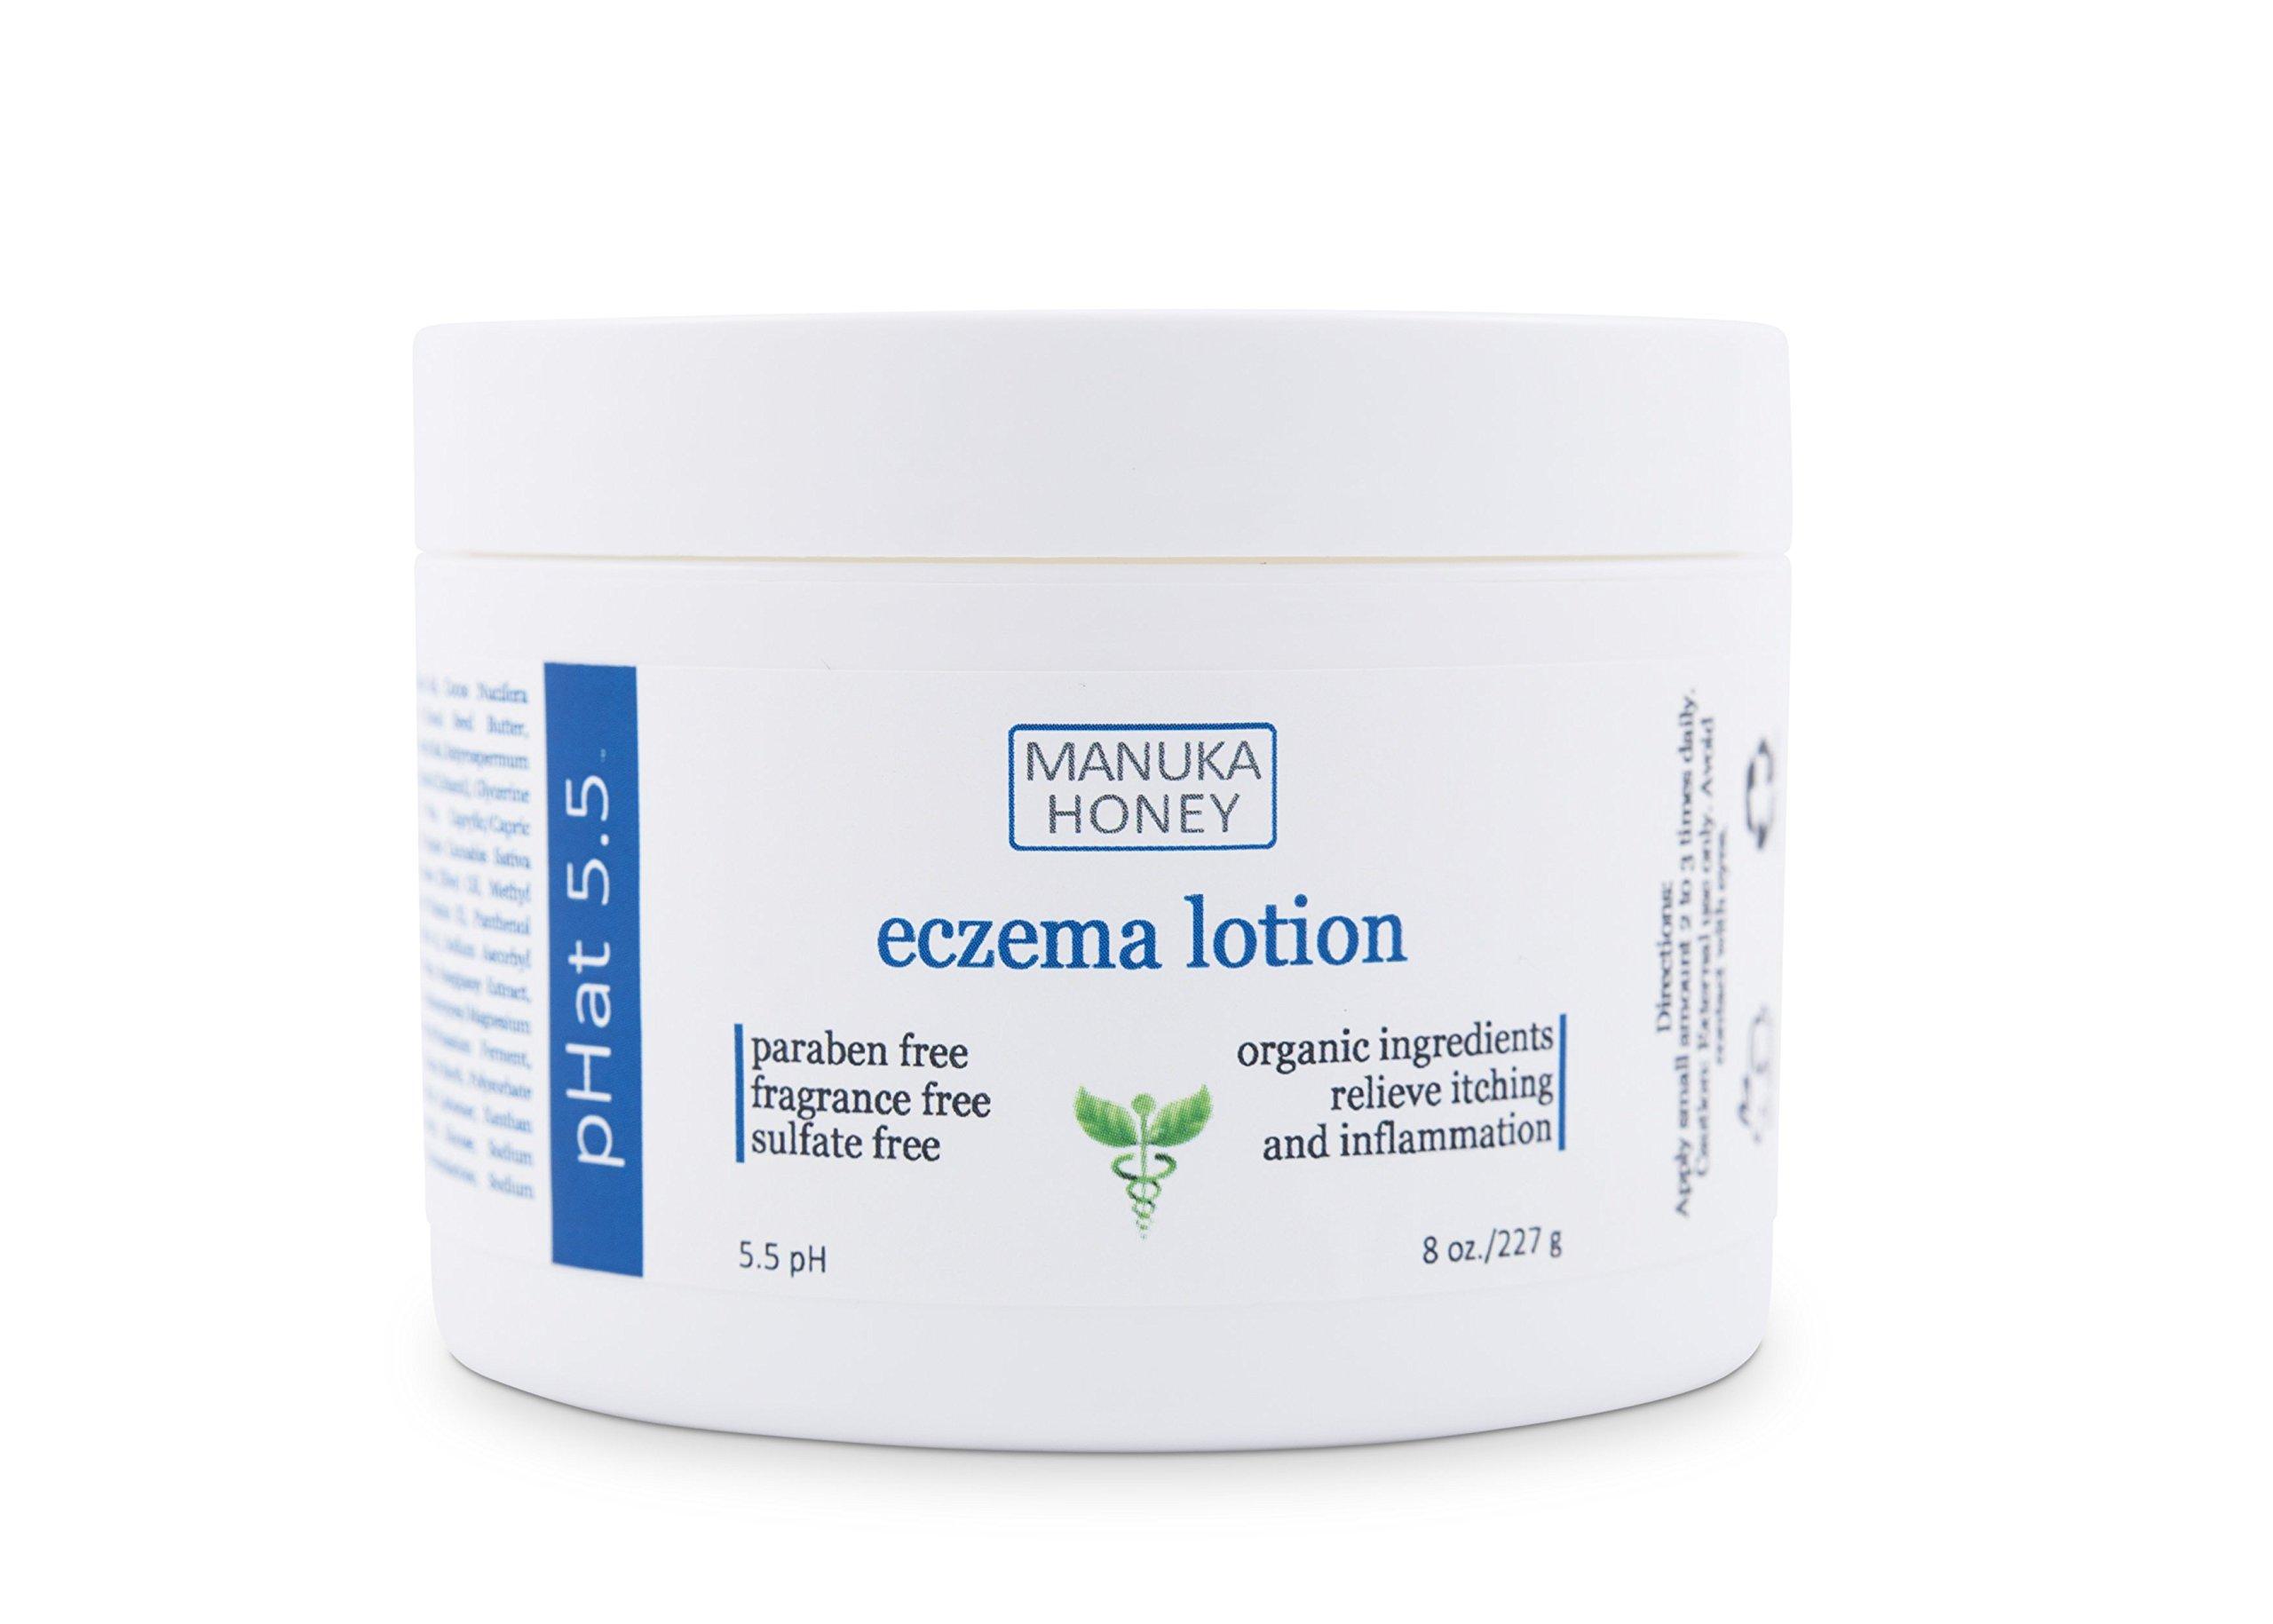 5 Ultra-Calming Ingredients to Soothe Eczema foto